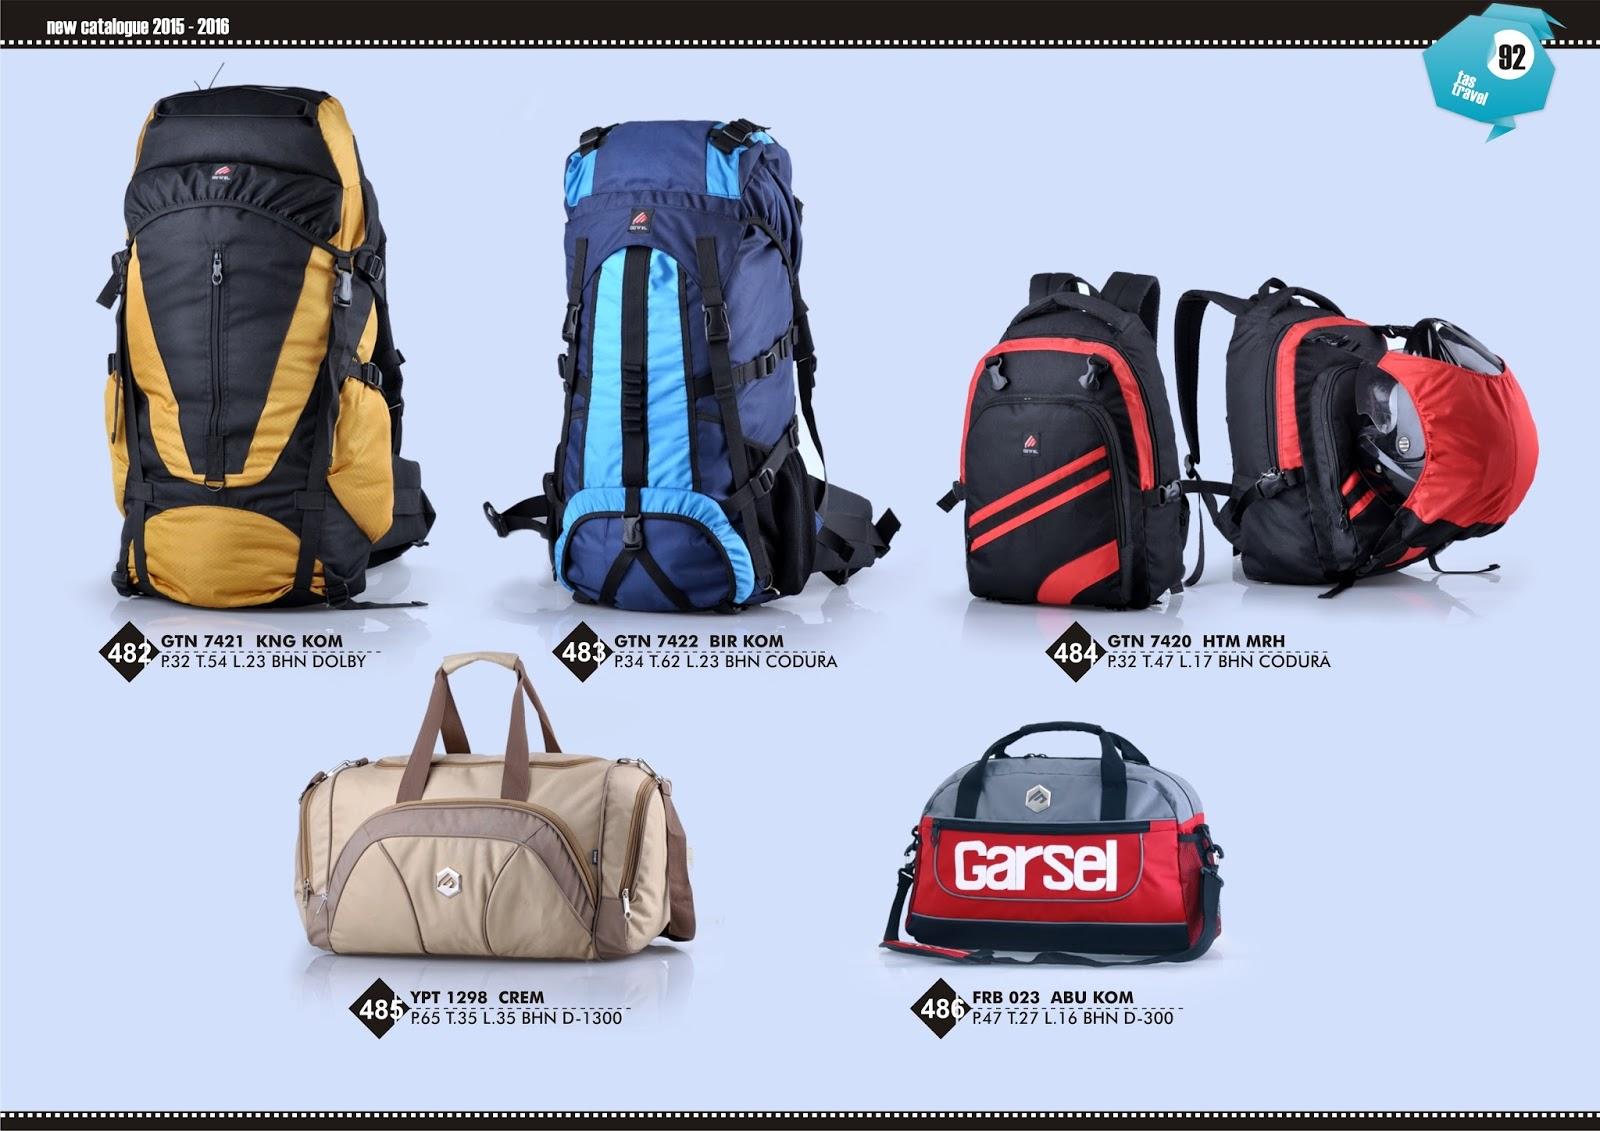 Jual Tas Anak Garsel Welcome To Katalog Dompet Fashion